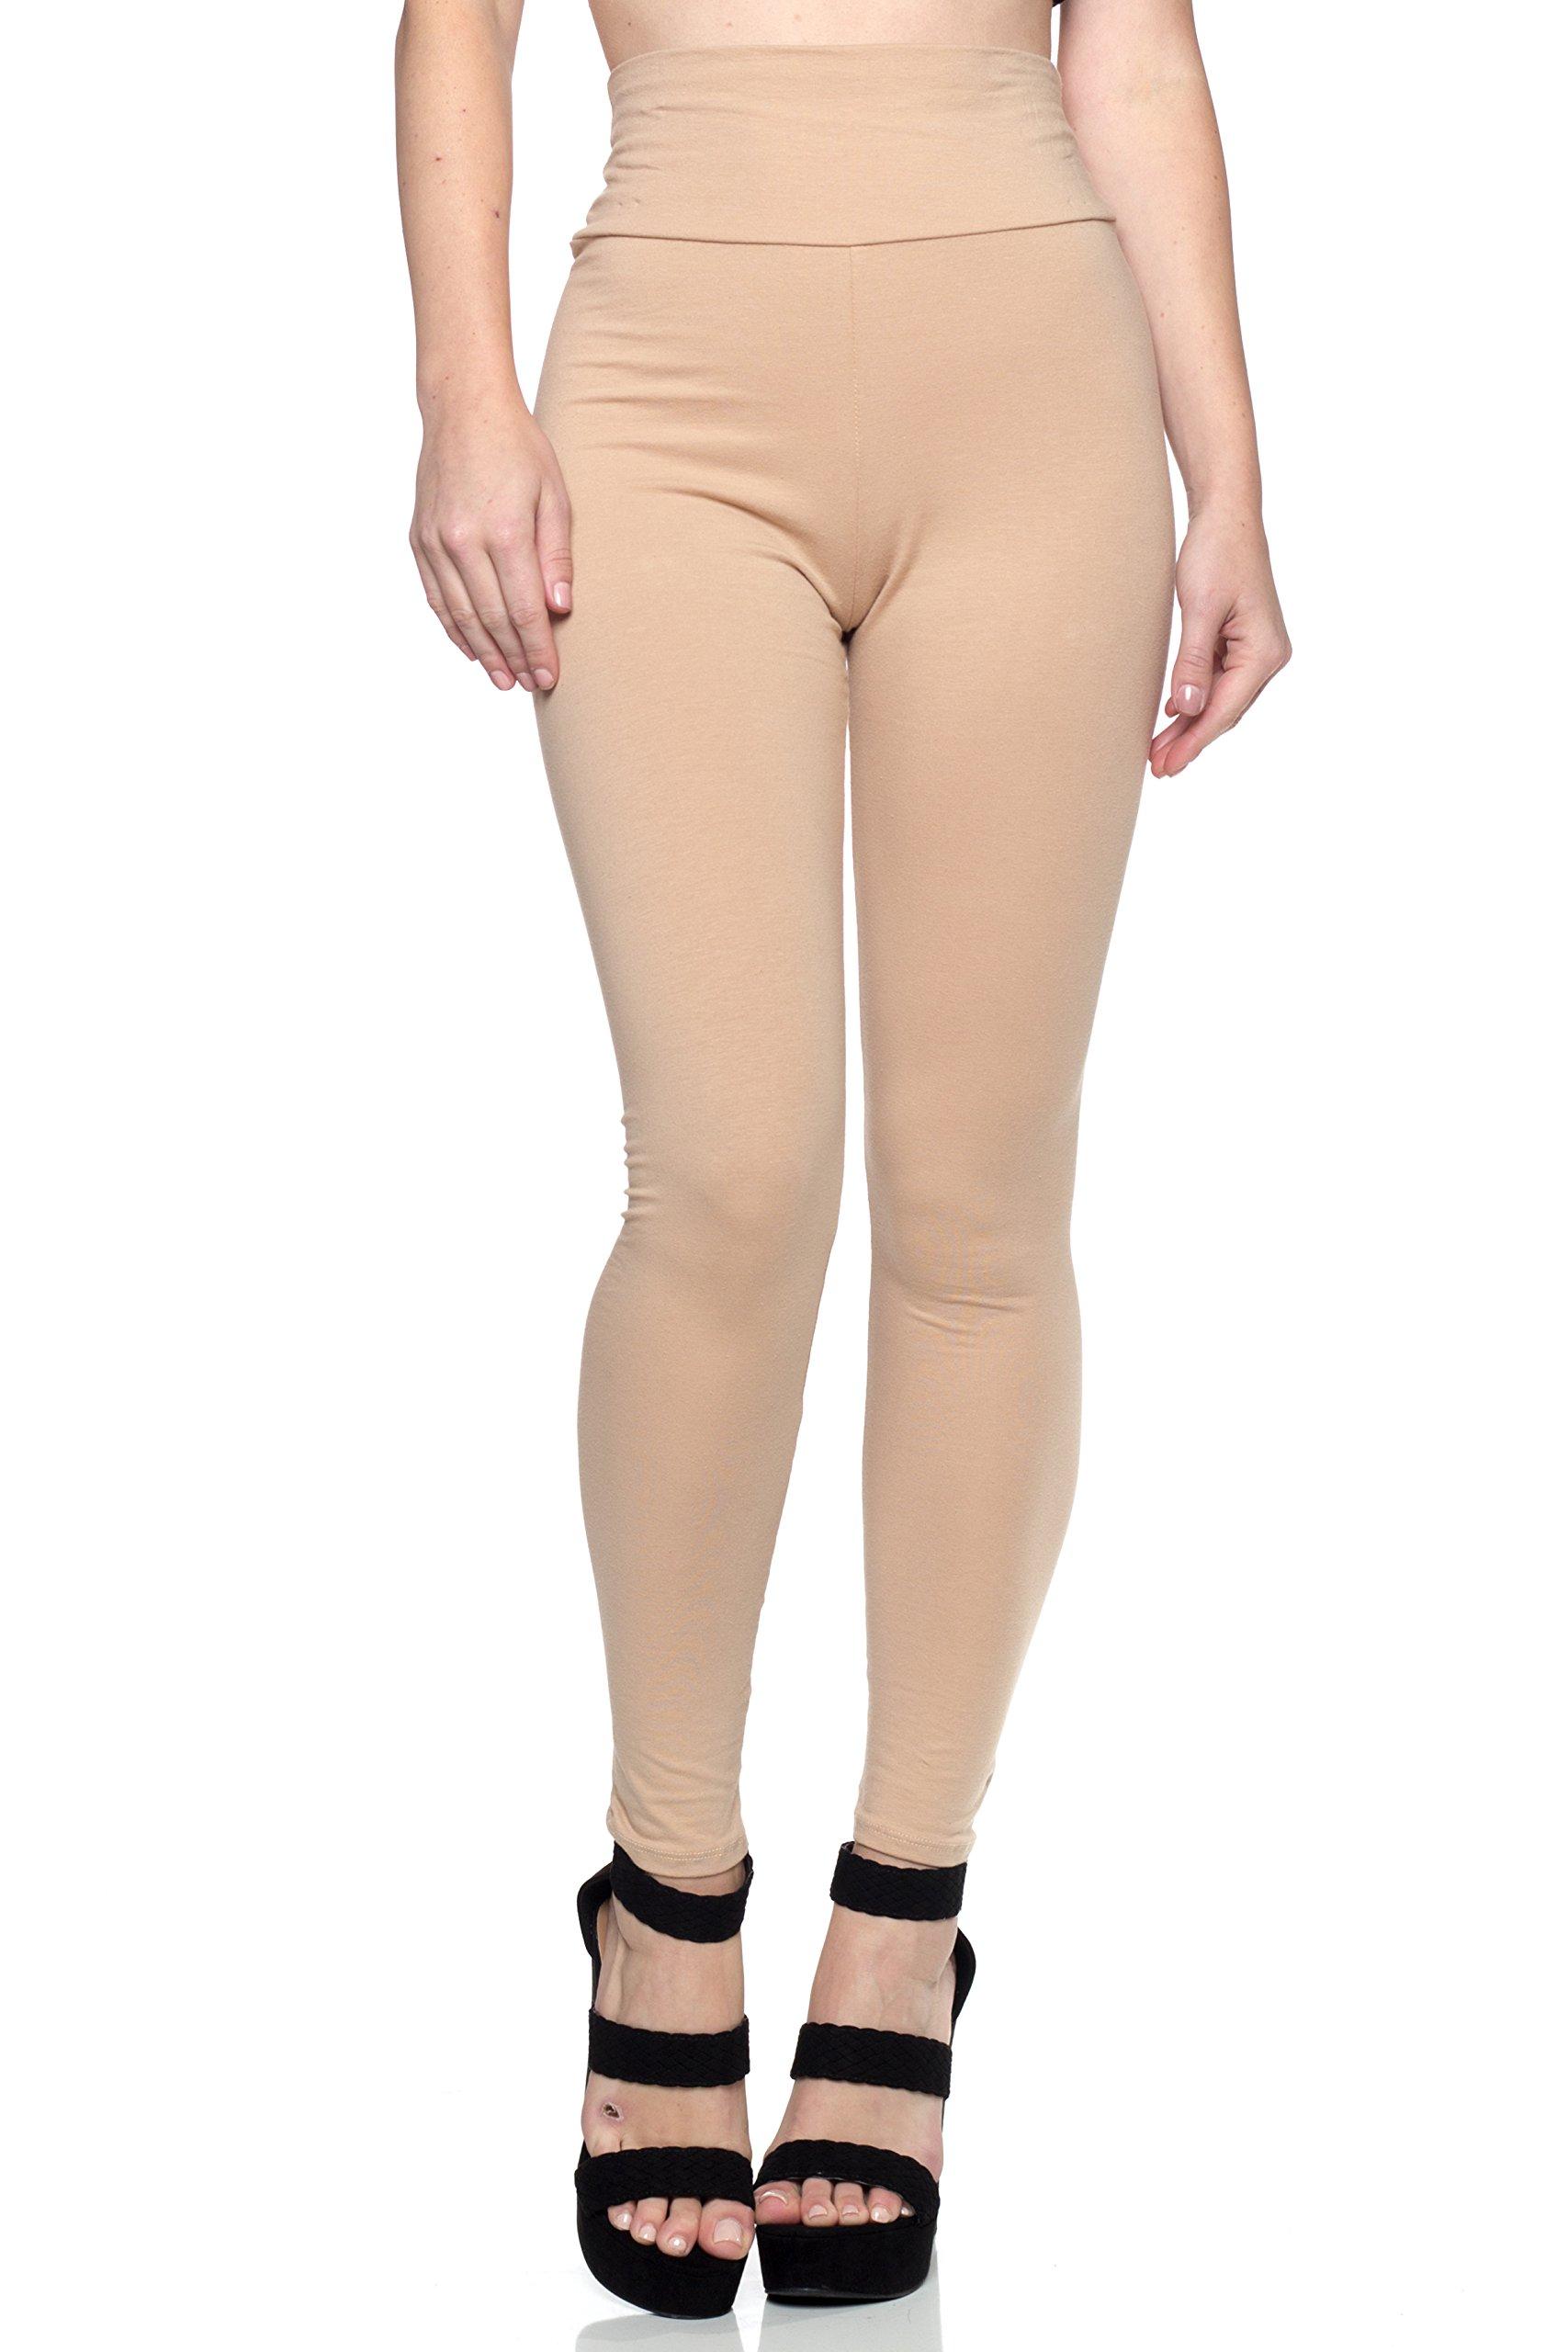 Women's Junior Plus J2 Love Cotton High Waist Leggings, 3X, Nude